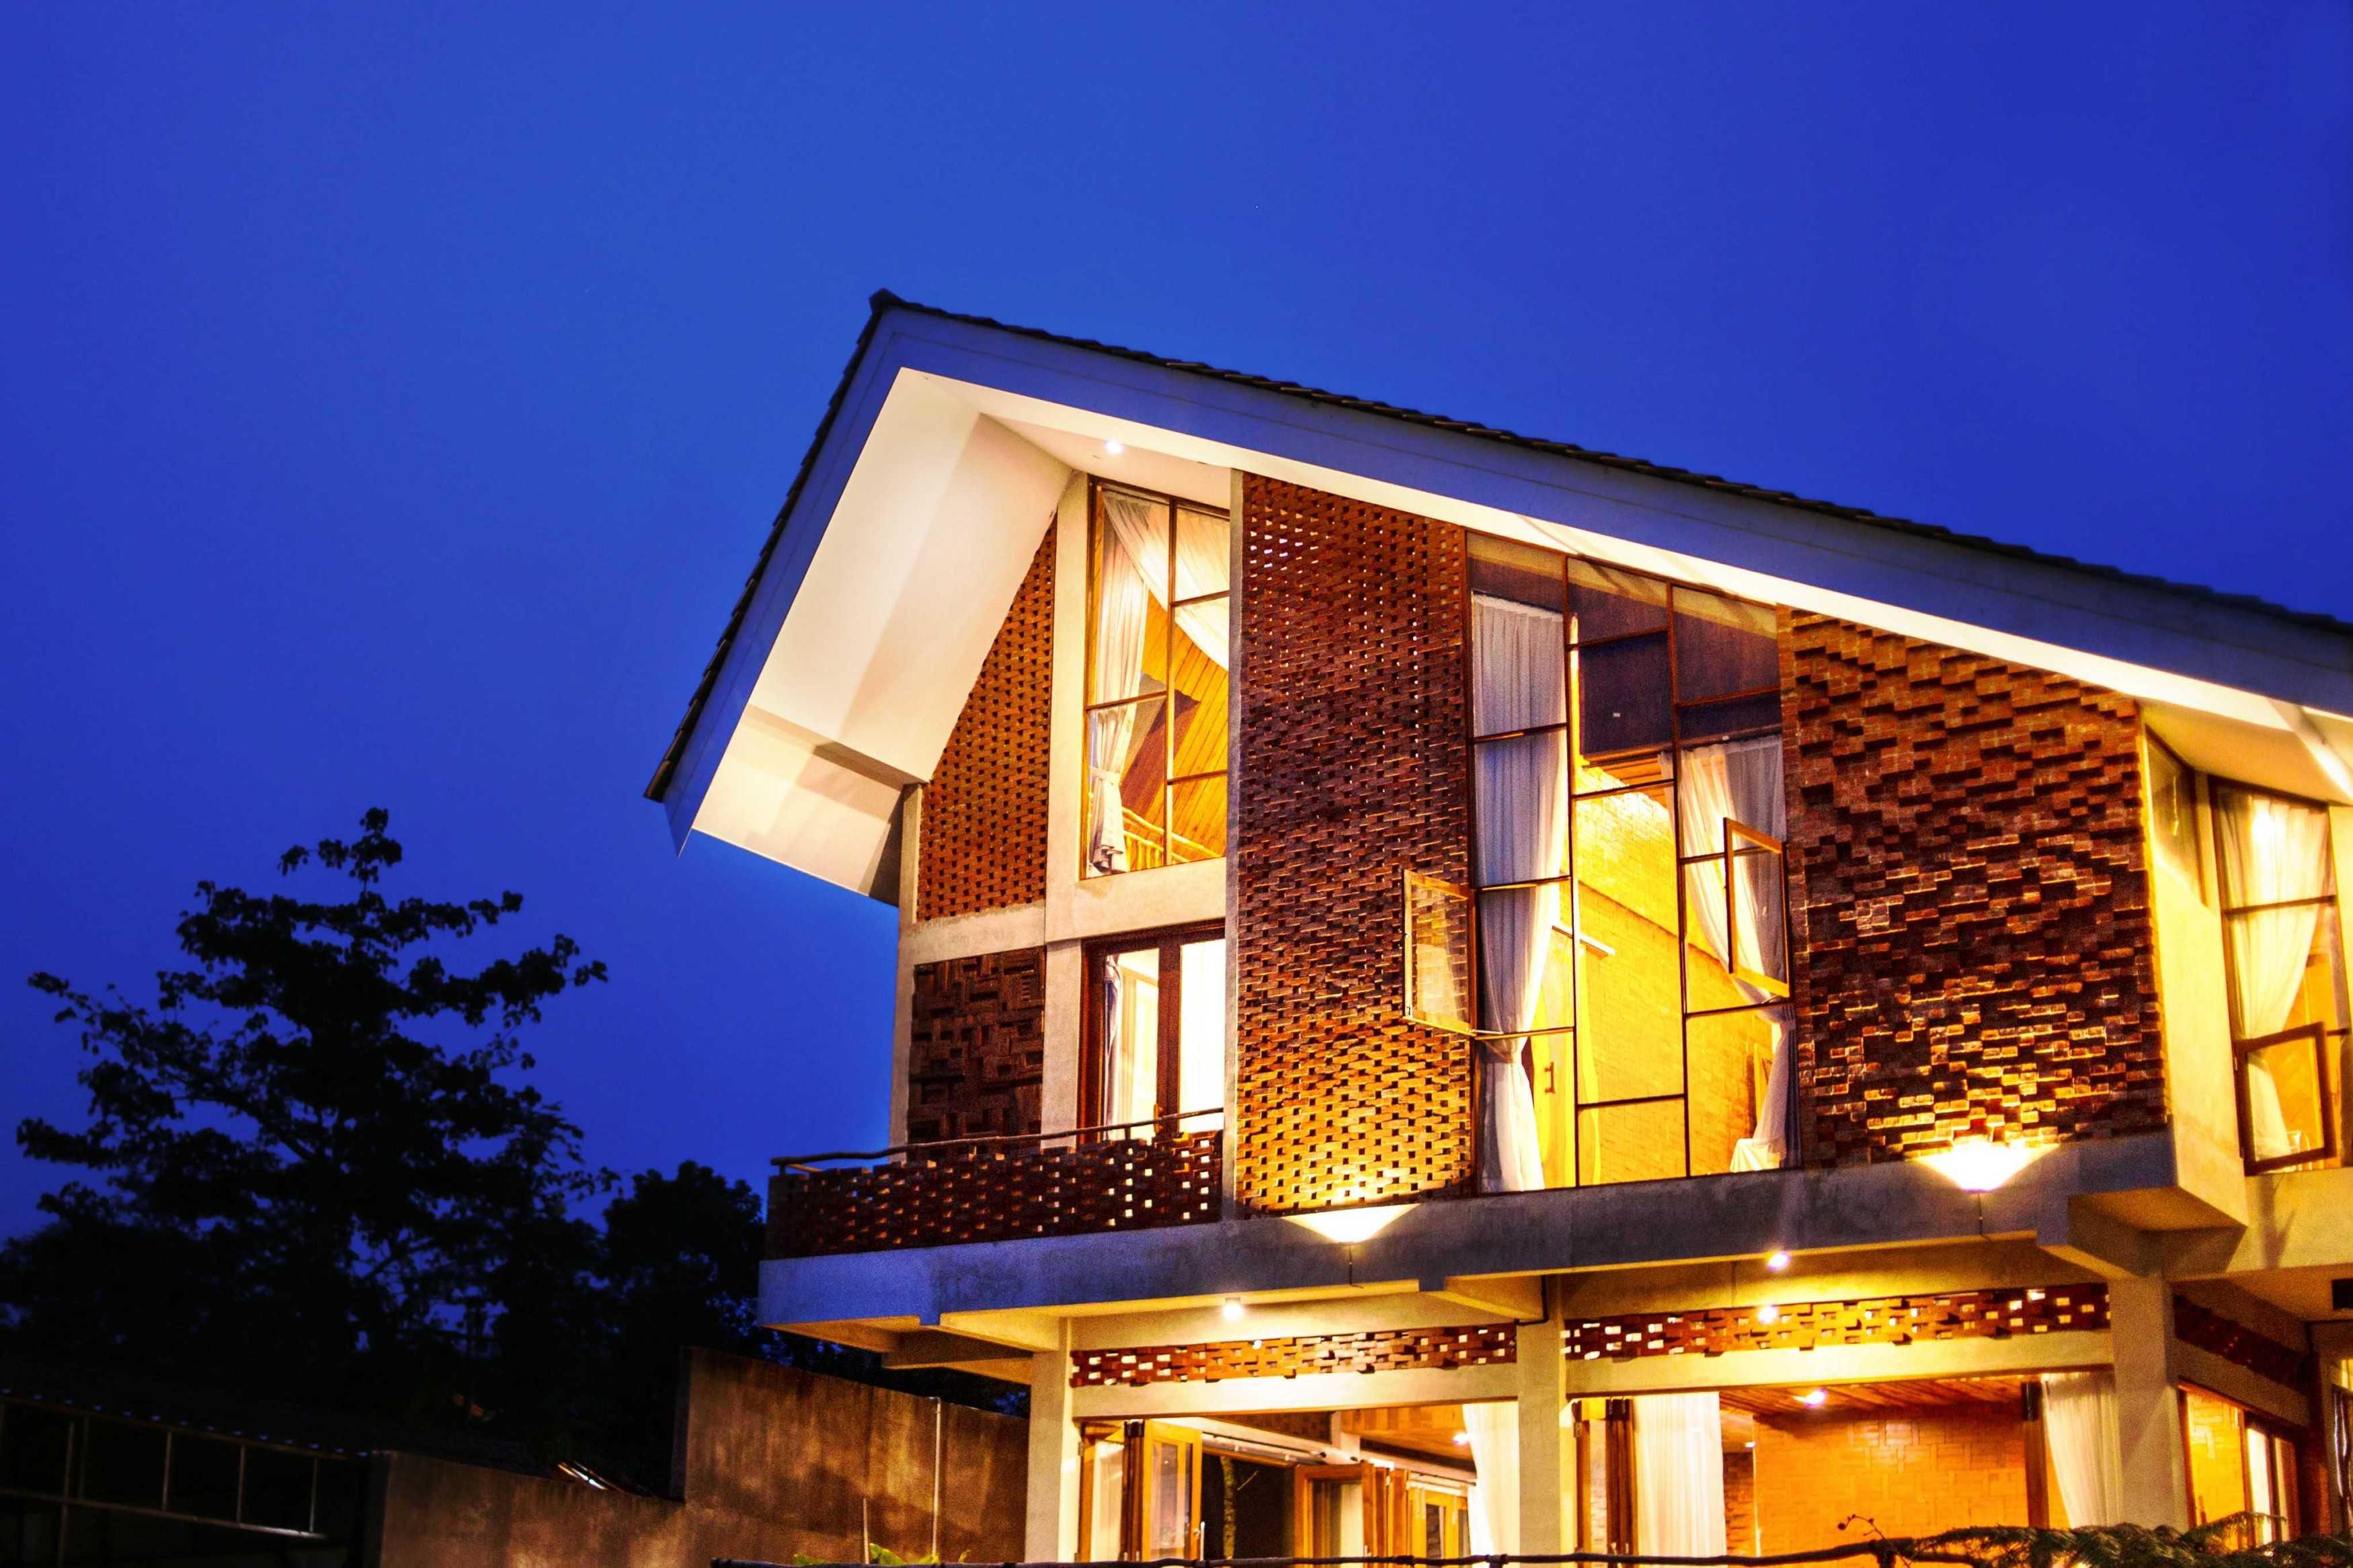 Junge Architekt Studio Imah Bata Villa, Bandung Indonesia Sindanglaya, Cimenyan, Bandung, Jawa Barat, Indonesia Sindanglaya, Cimenyan, Bandung, Jawa Barat, Indonesia Junge-Architekt-Studio-Imah-Bata-Villa-Bandung-Indonesia   67742